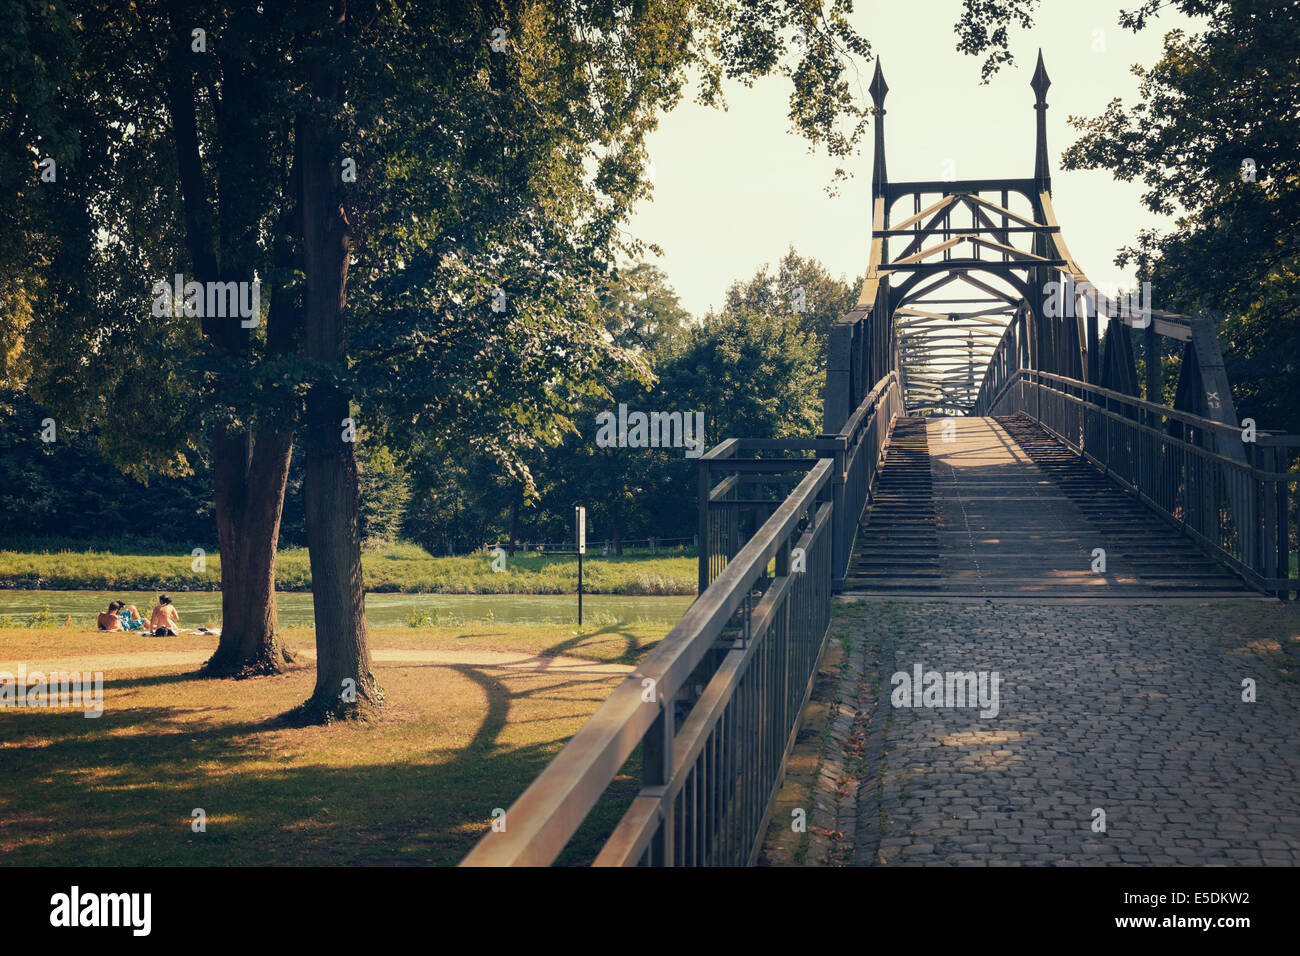 Germany, North Rhine-Westphalia, Hoerstel, bridge over Dortmund-Ems Canal - Stock Image